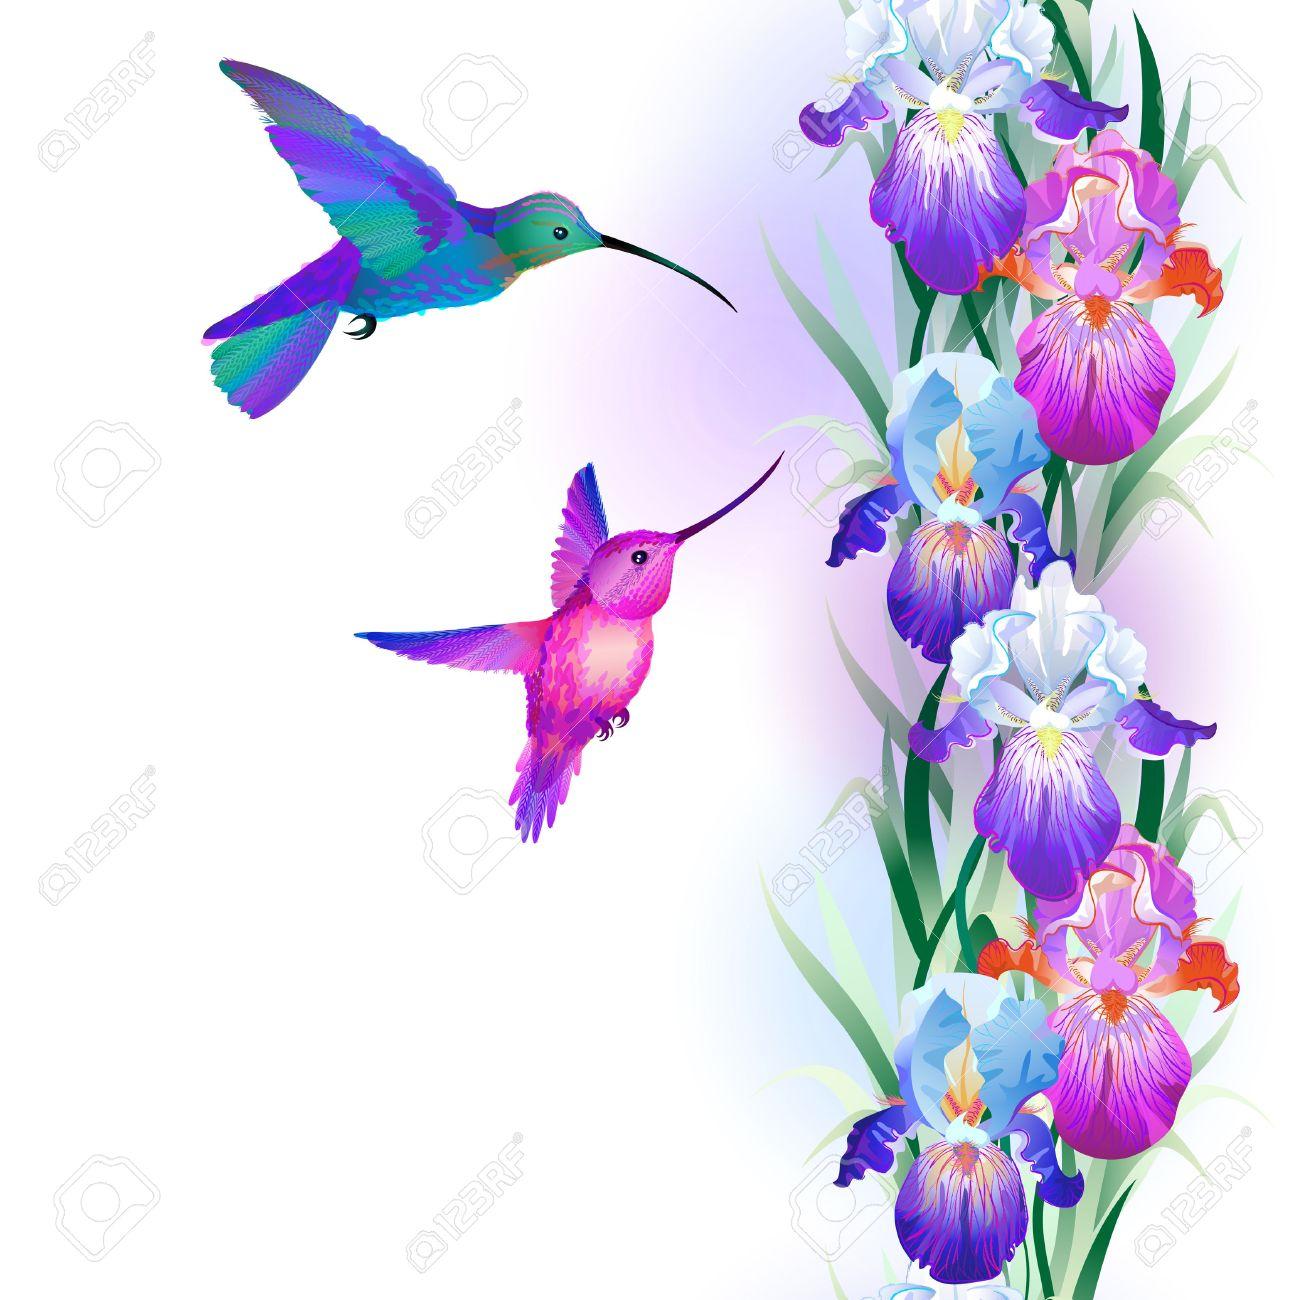 Iris clipart violet Clipart Iris iris #3 flower